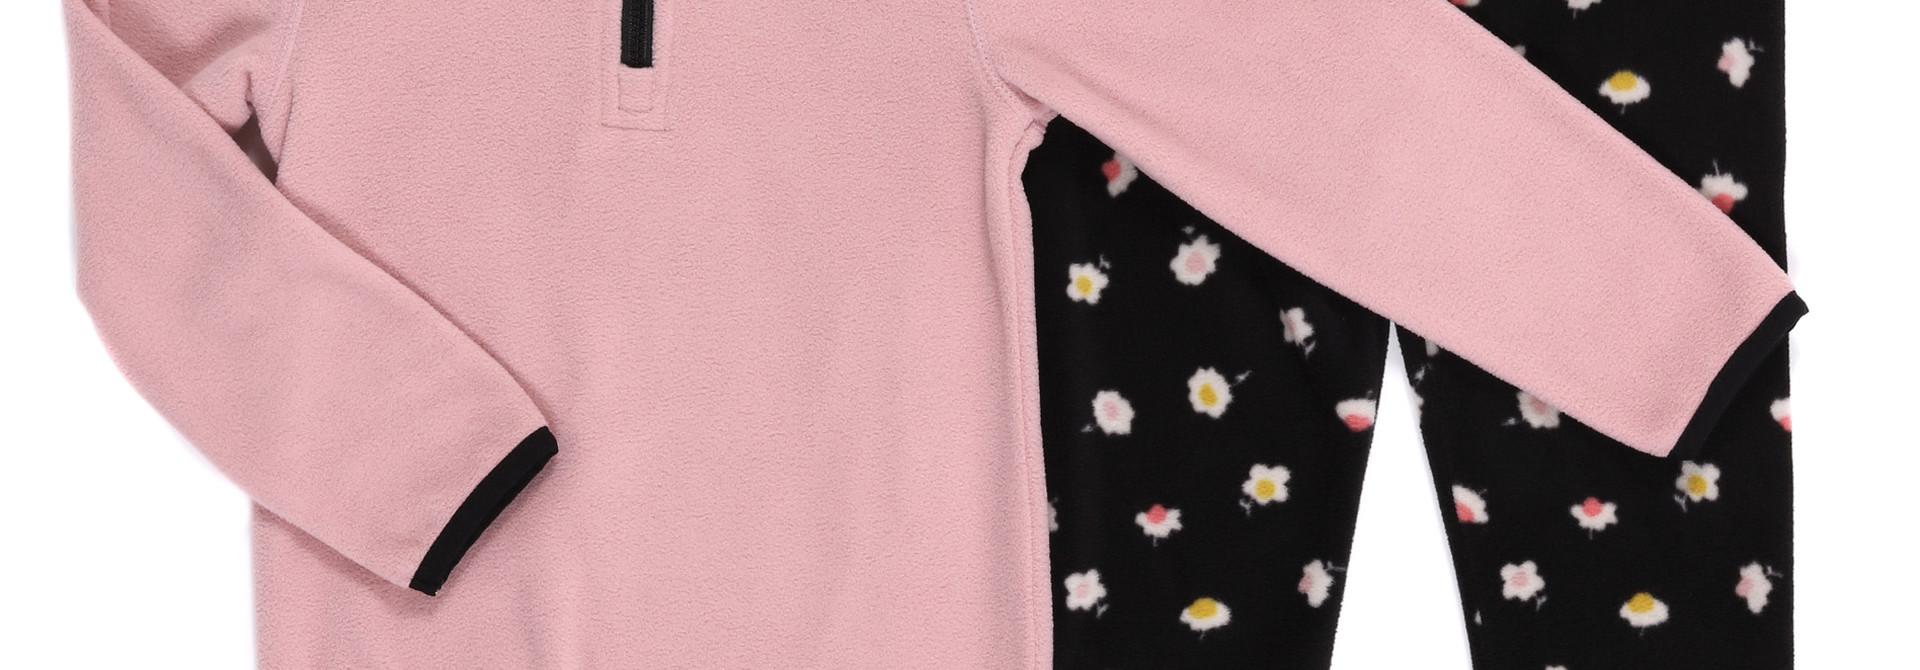 Sous-vêtement en micropolar Rose